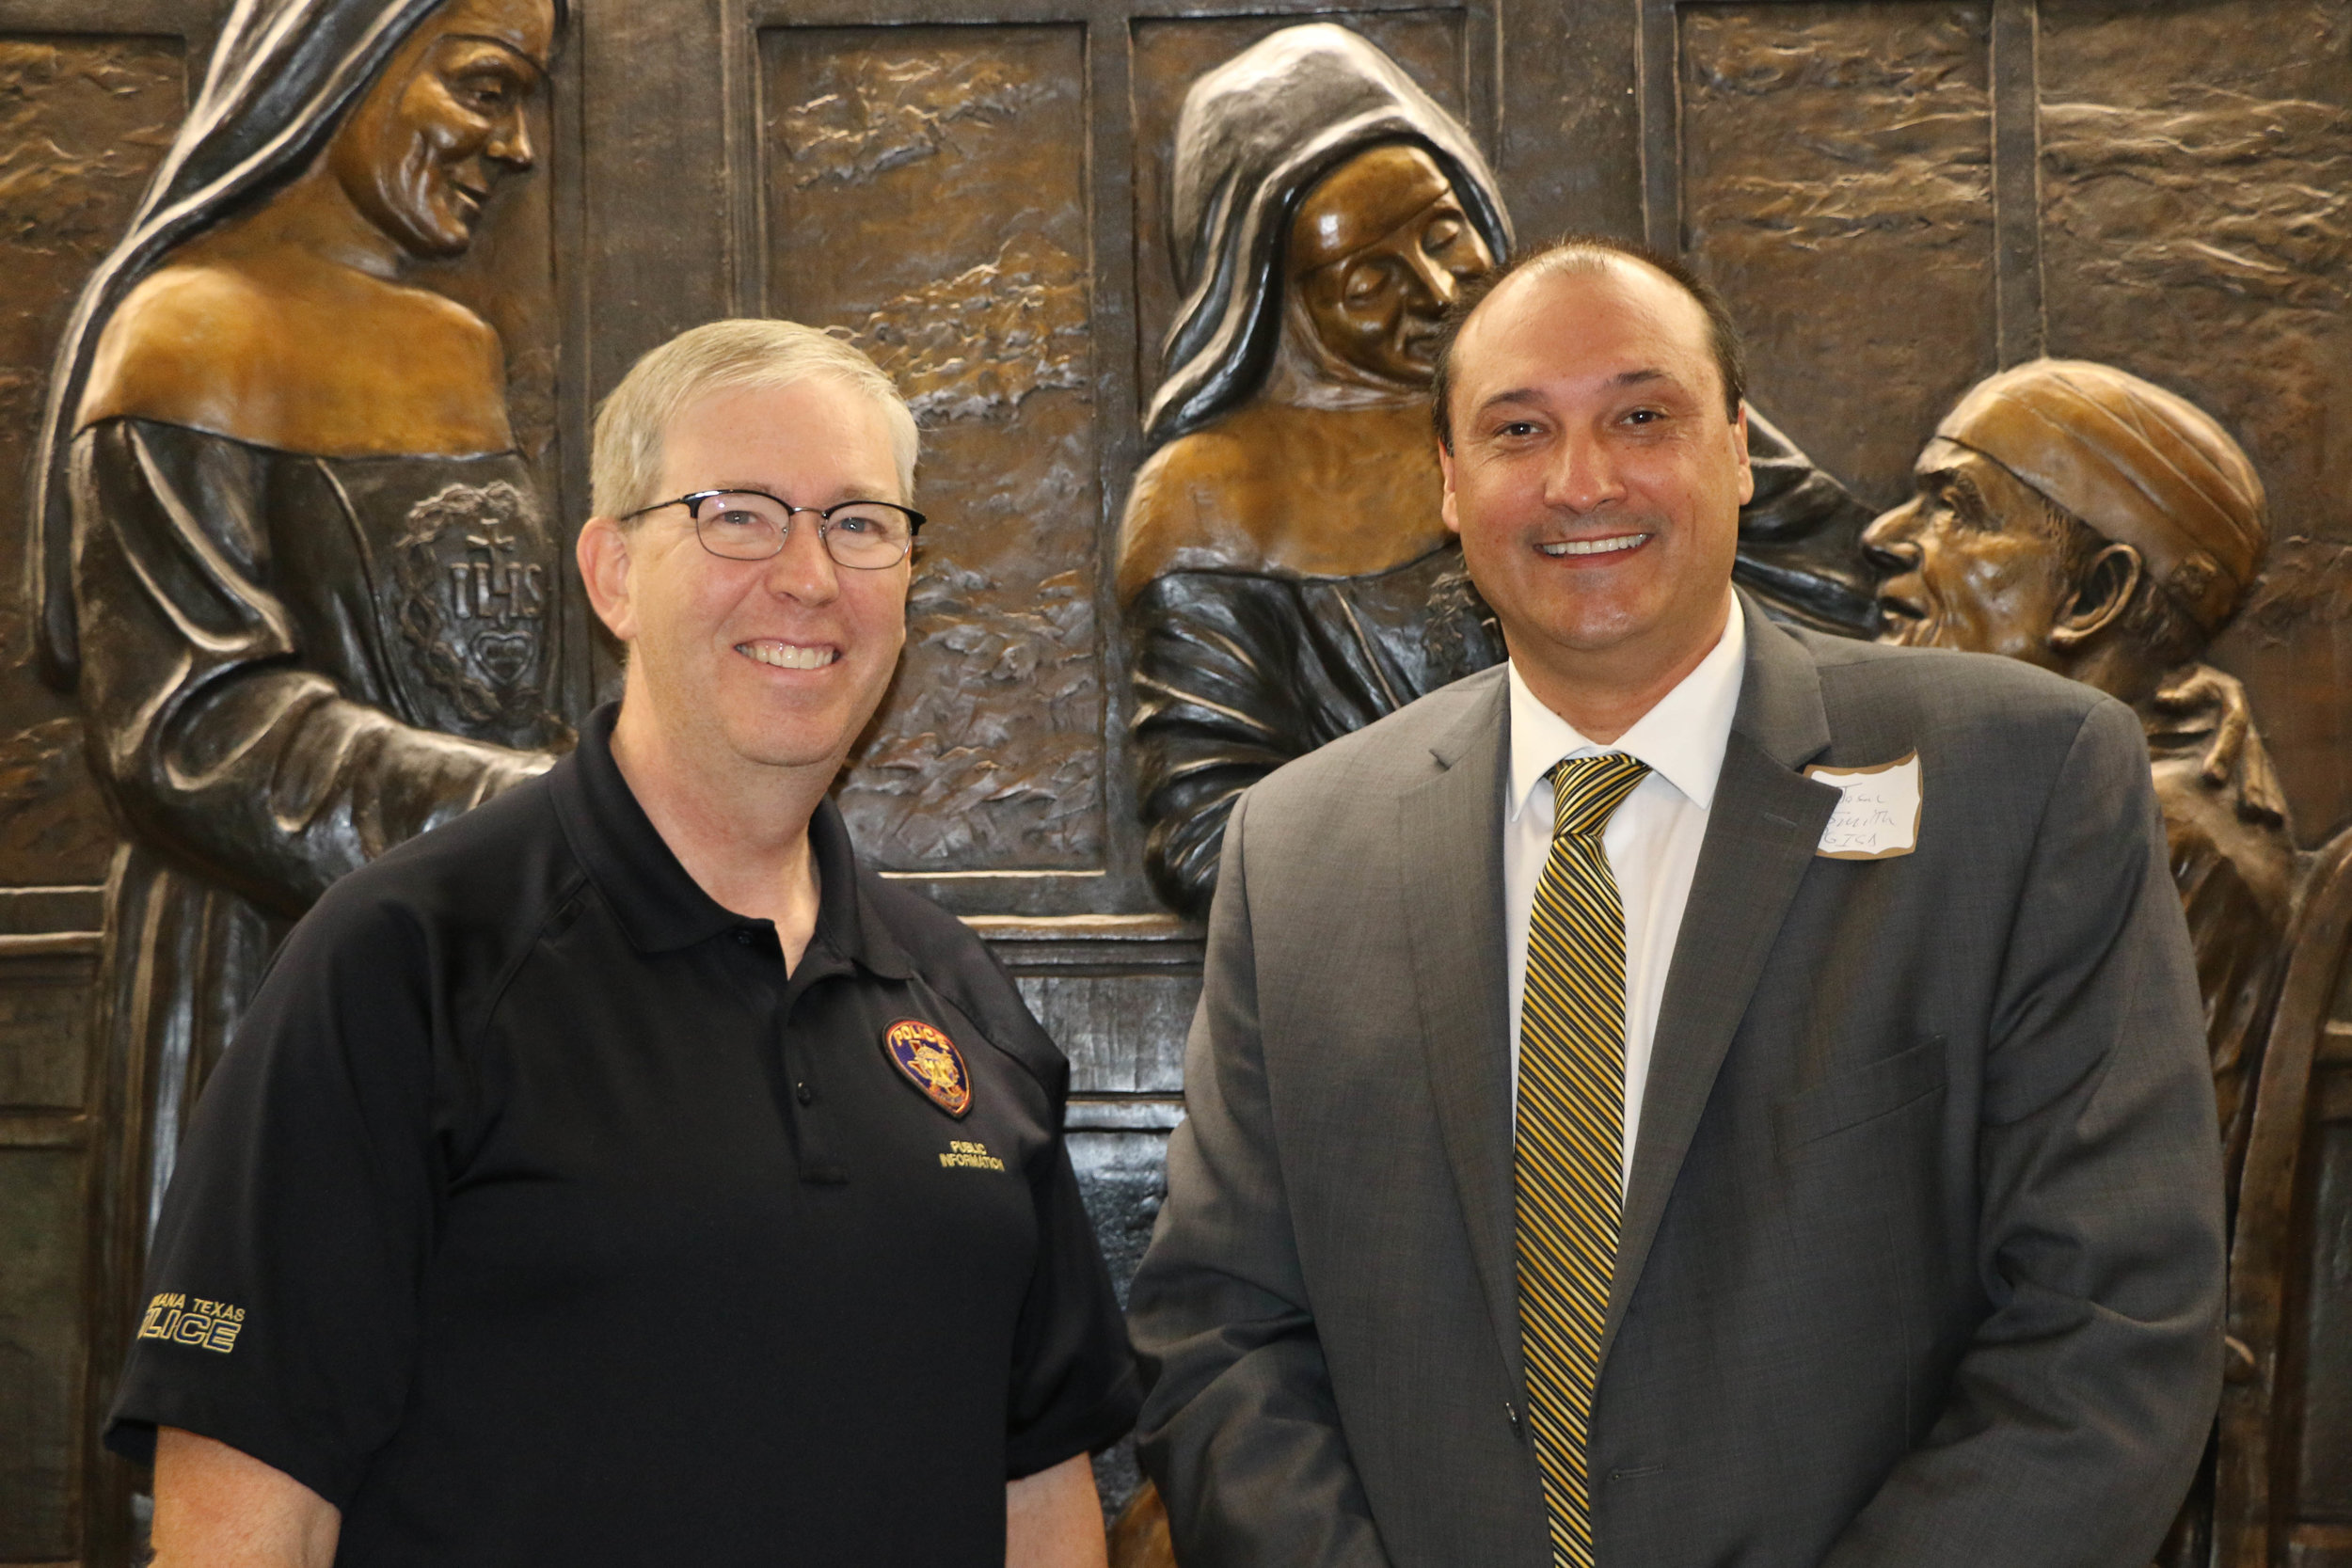 Shawn Vaughn and Dr. Jason Smith